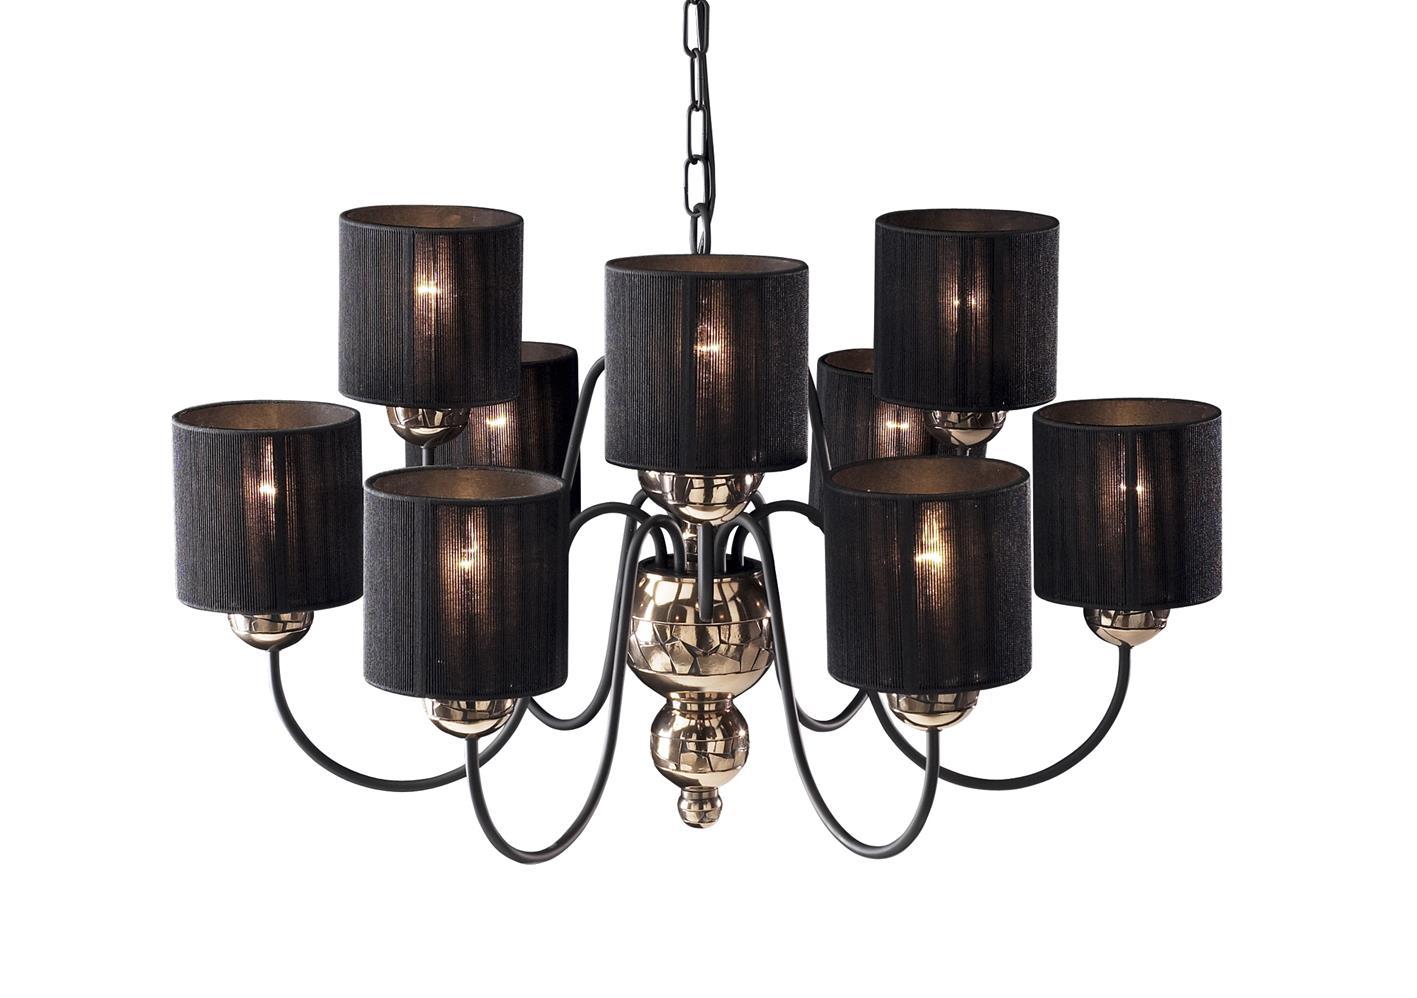 David Hunt Lighting GAR1363 Garbo 9 Light Pendant in Bronze Complete with Black String Shades